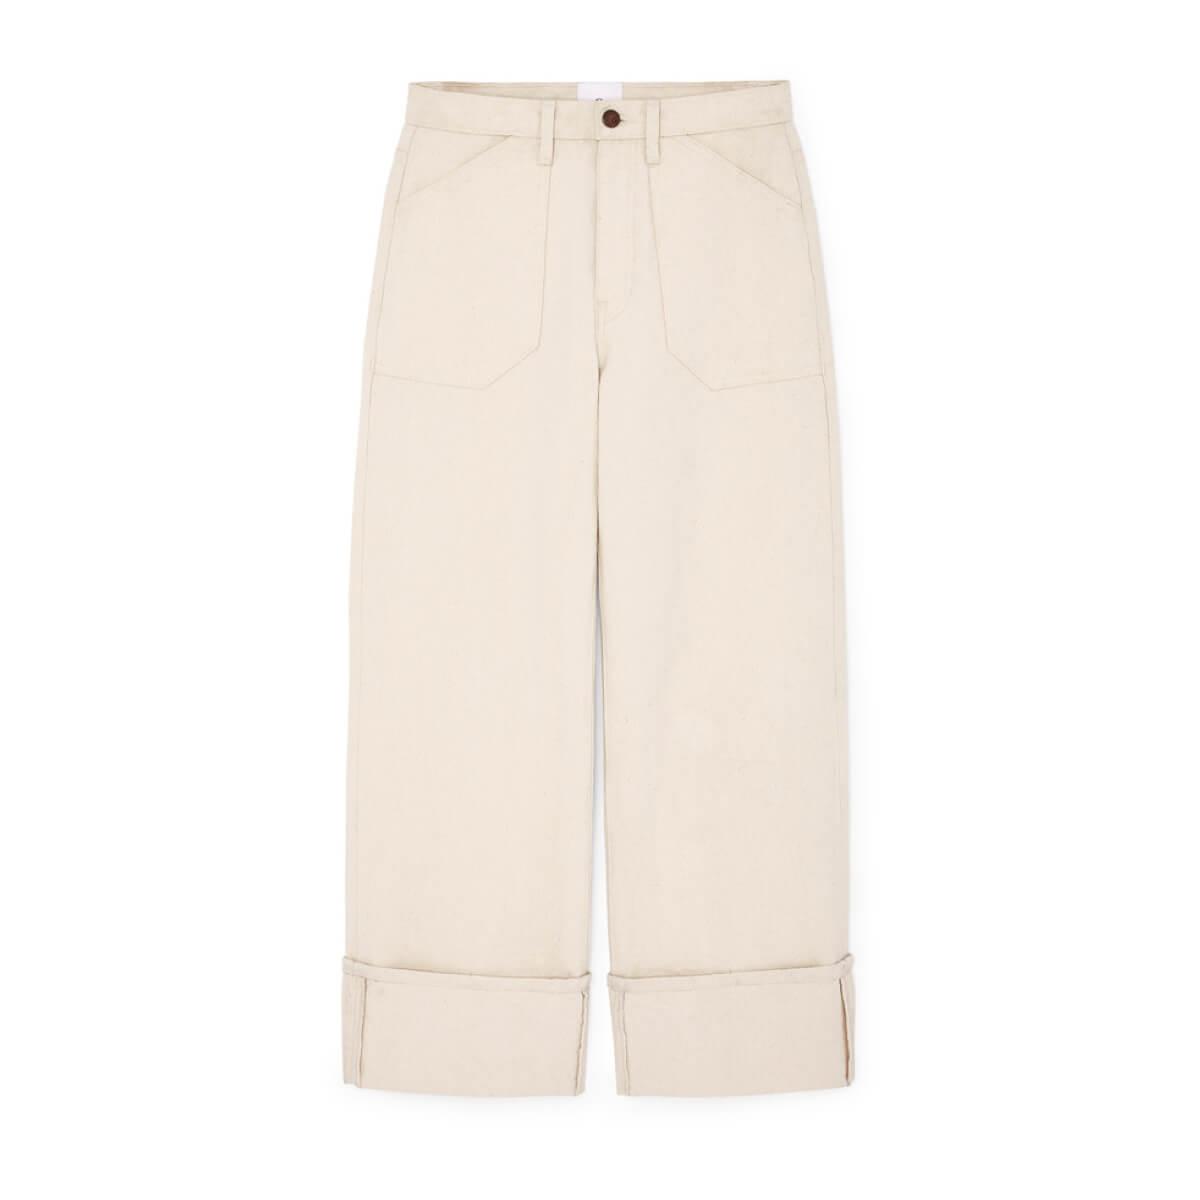 G. Label mario cuffed workwear jeans